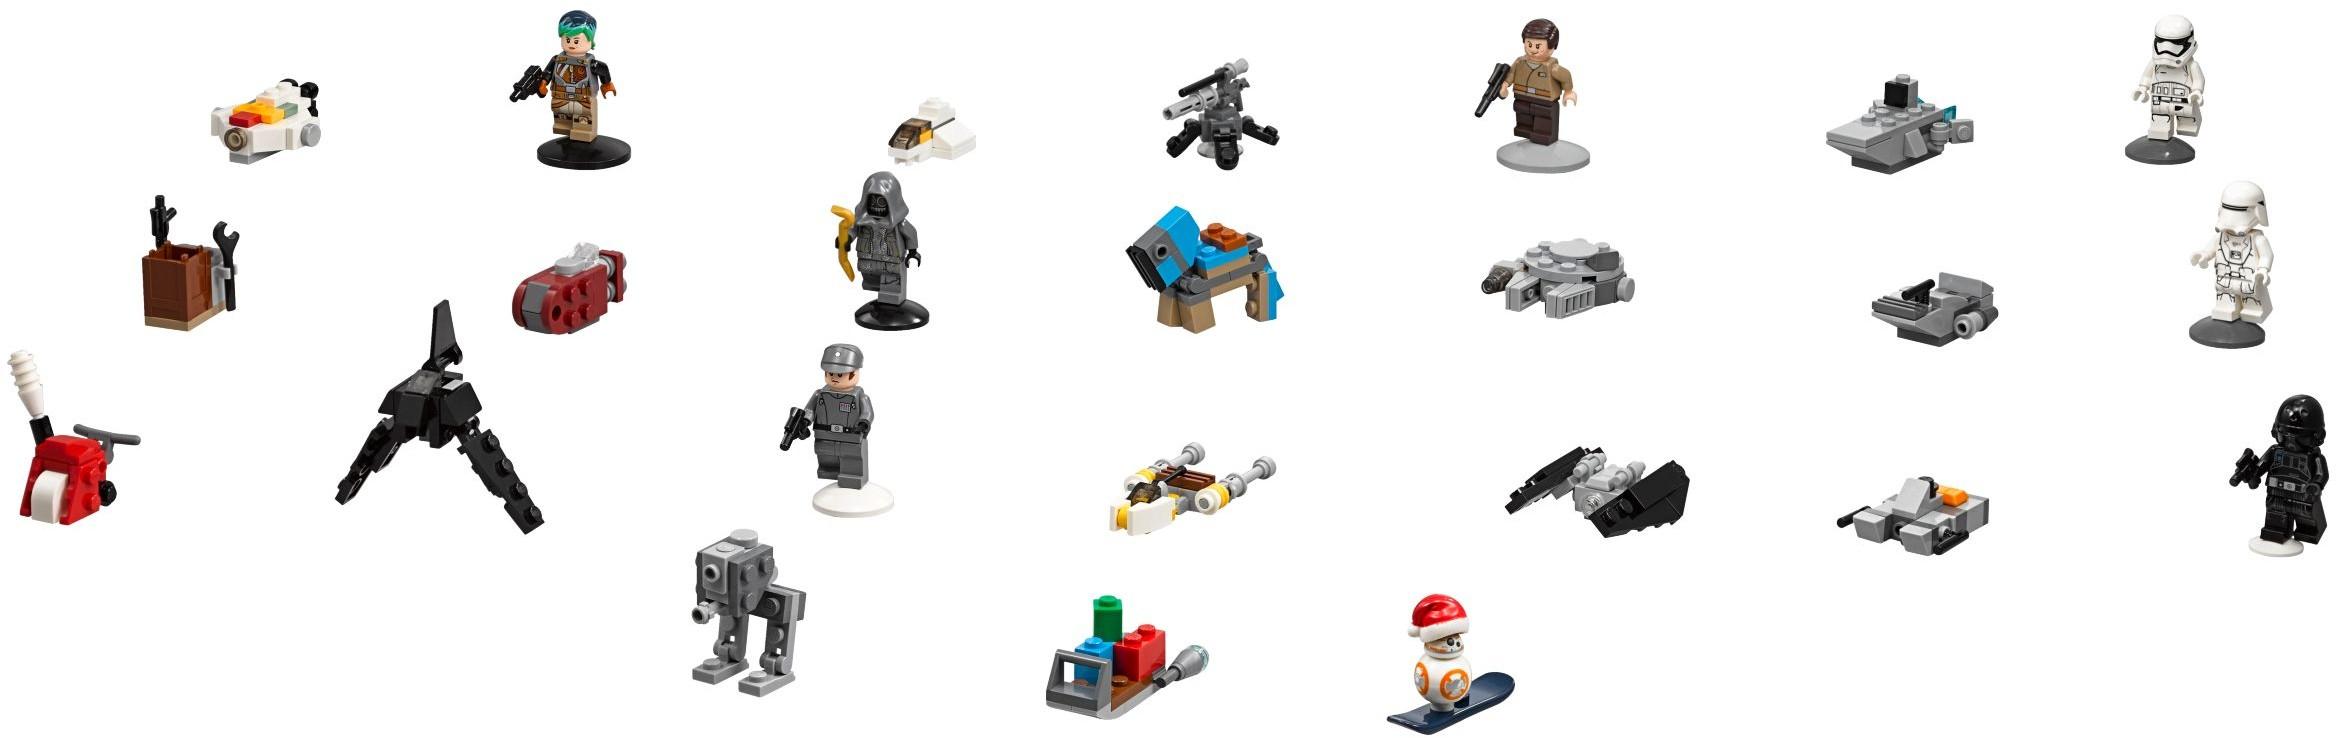 Lego 75184 Star Wars Advent Calendar Instructions, Star Wars pertaining to Lego 75213 Instructions